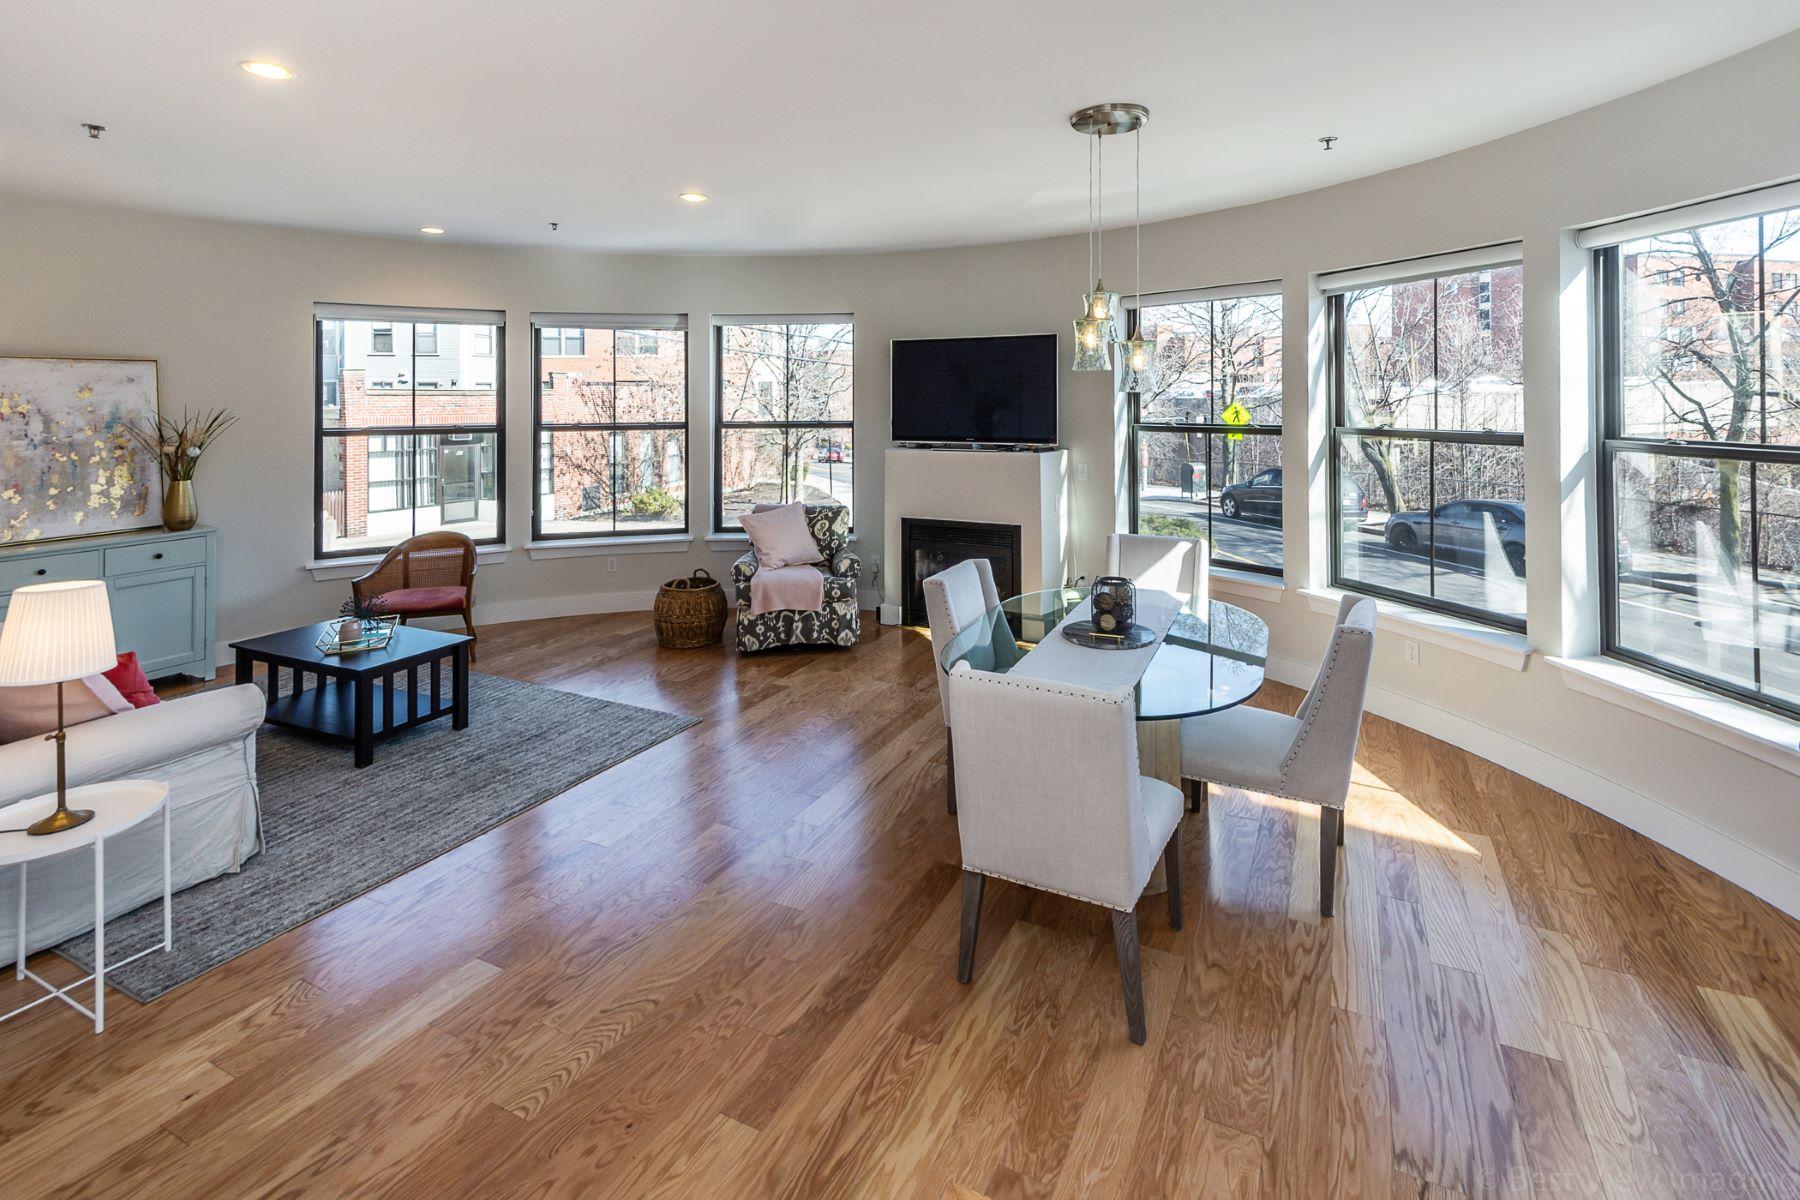 Condominiums 为 销售 在 55 Station Street 1A 布鲁克莱恩, 马萨诸塞州 02445 美国